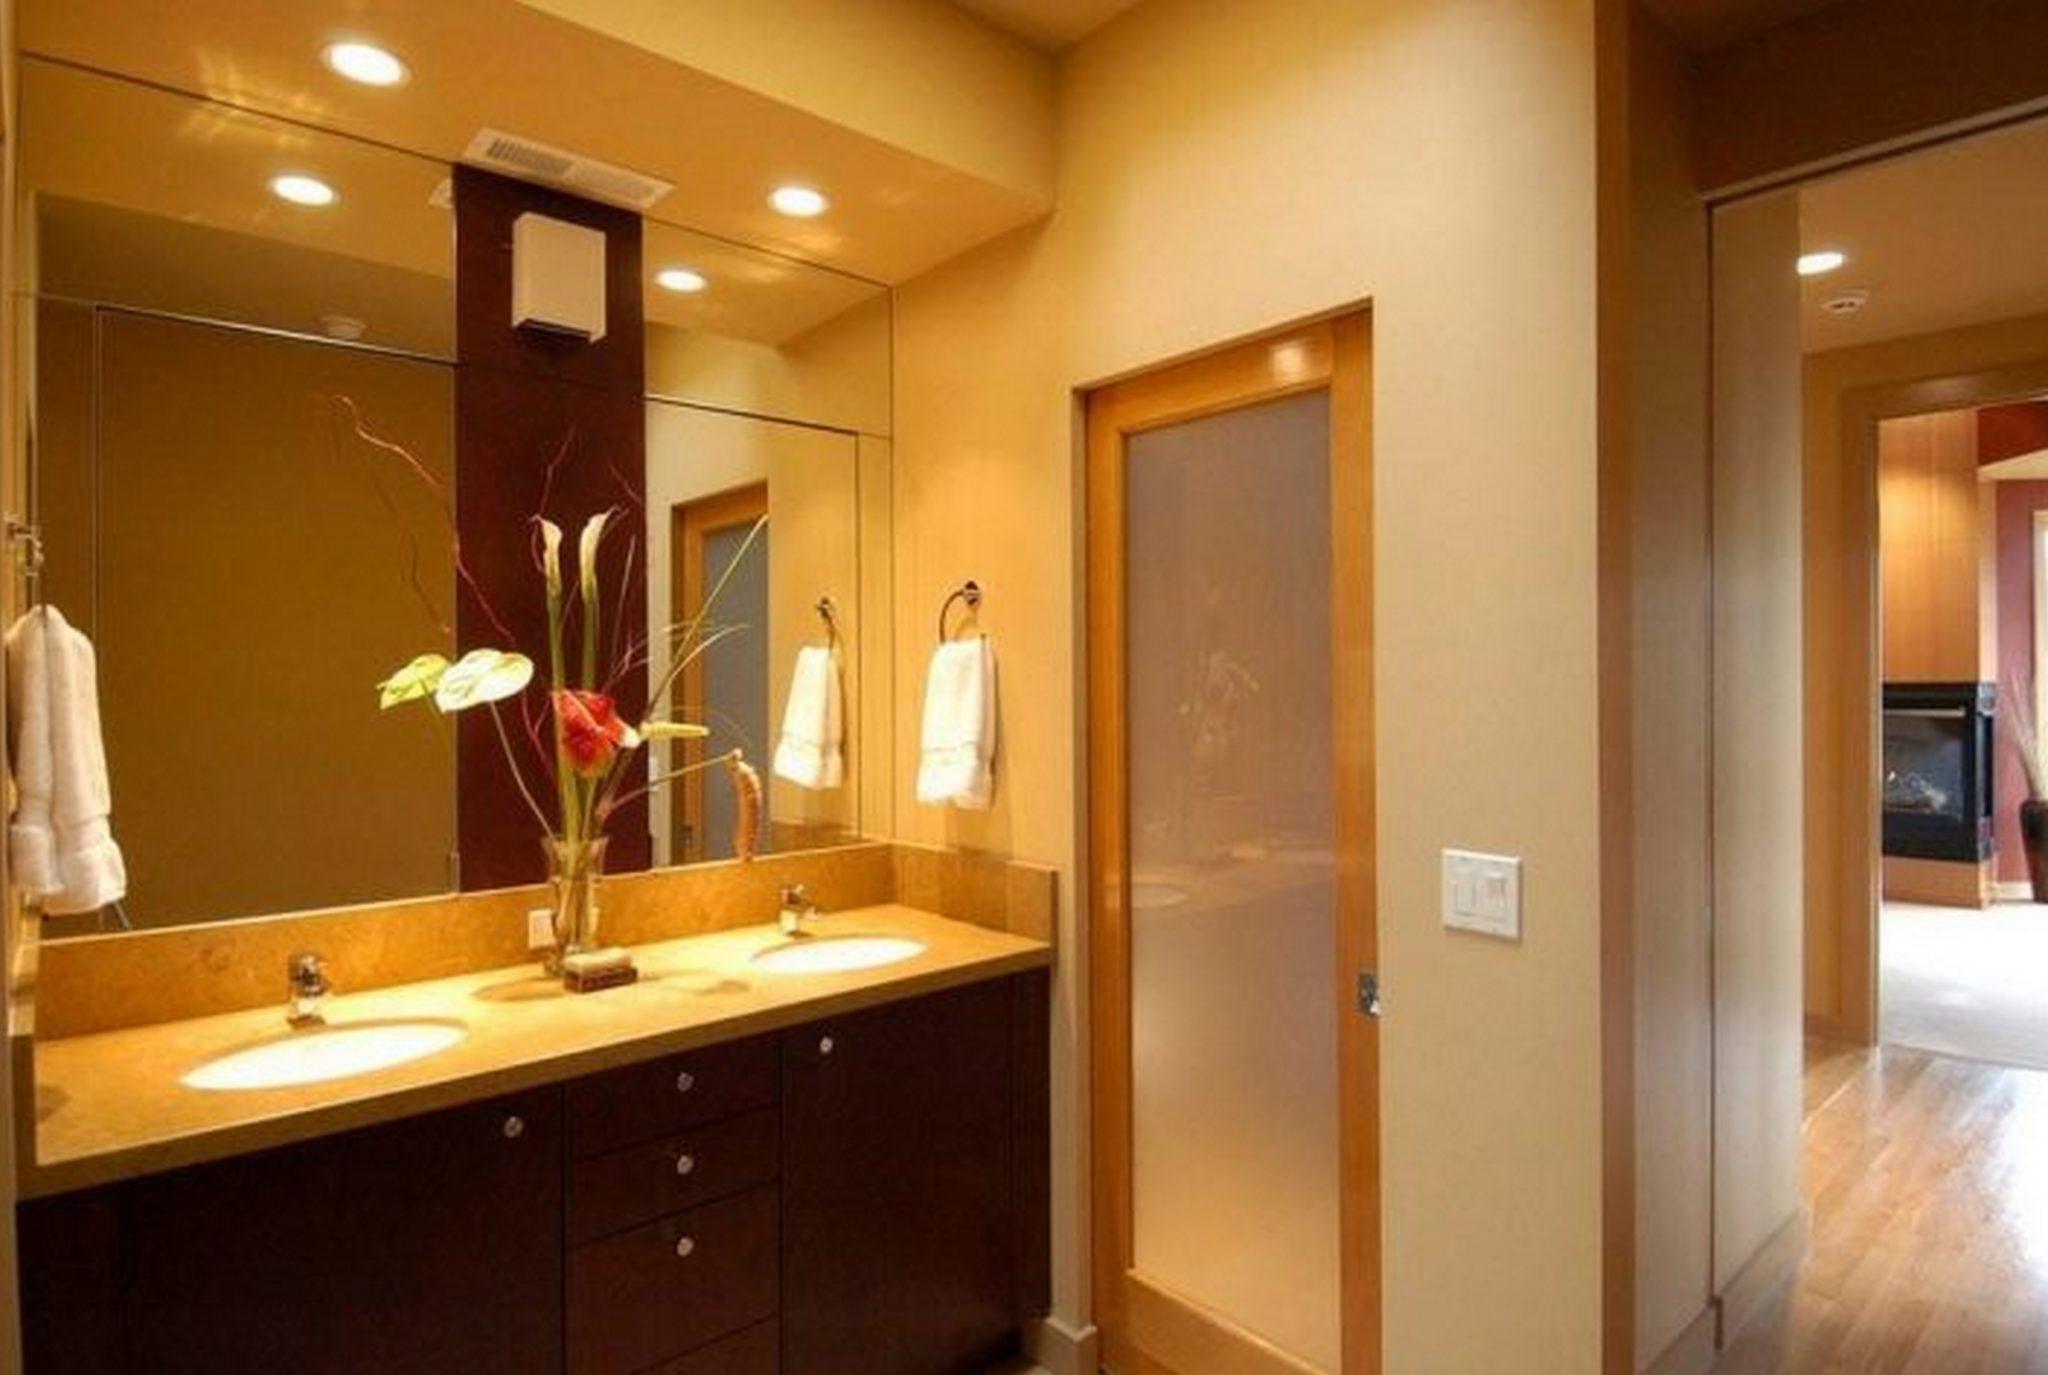 Двери для ванной и туалета 60х190 (600 на 1900)